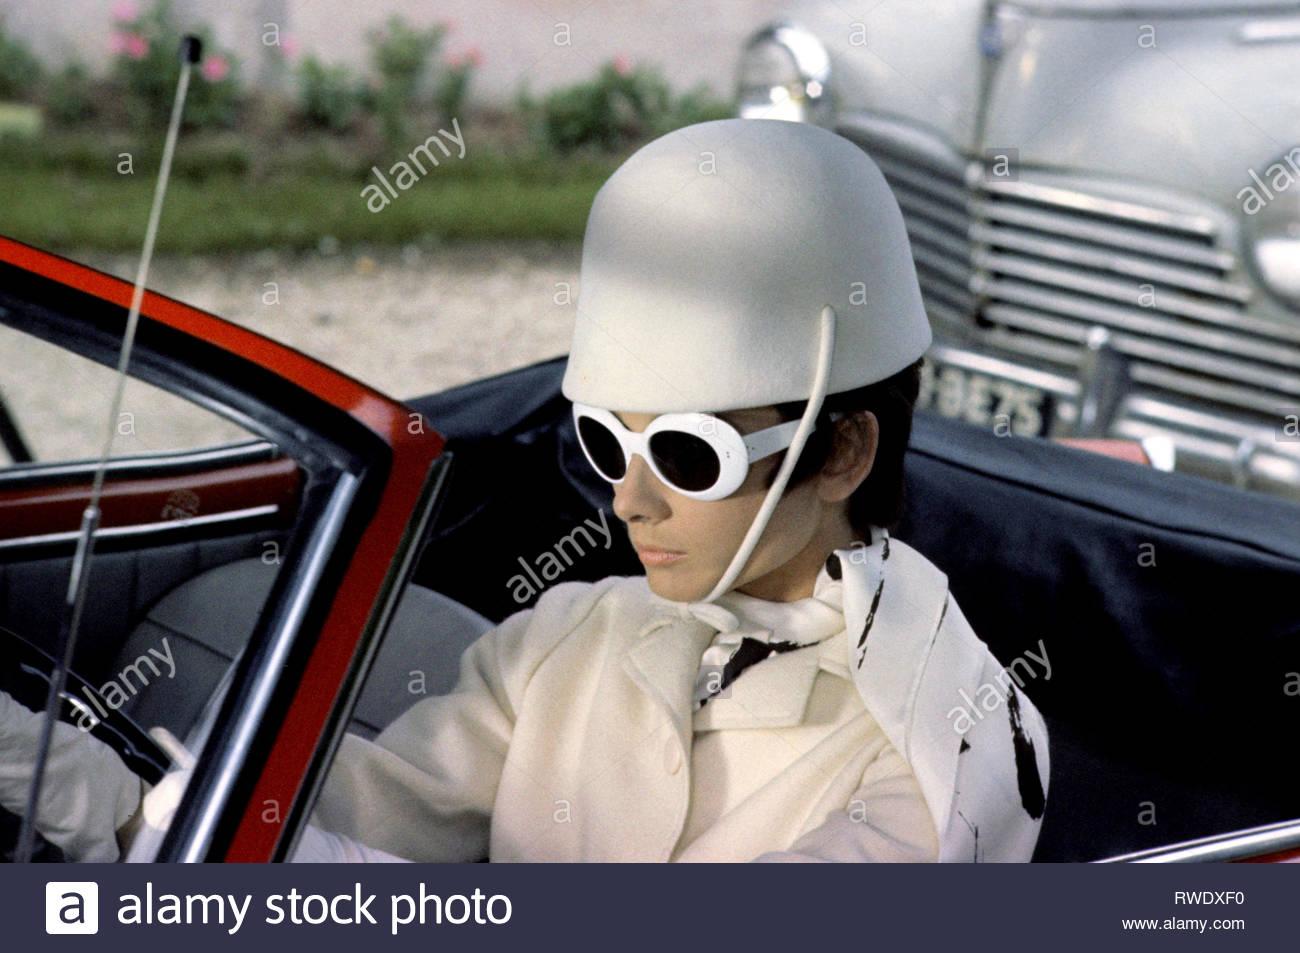 AUDREY HEPBURN, COMMENT VOLER UN MILLION DE DOLLARS, 1966 Photo Stock